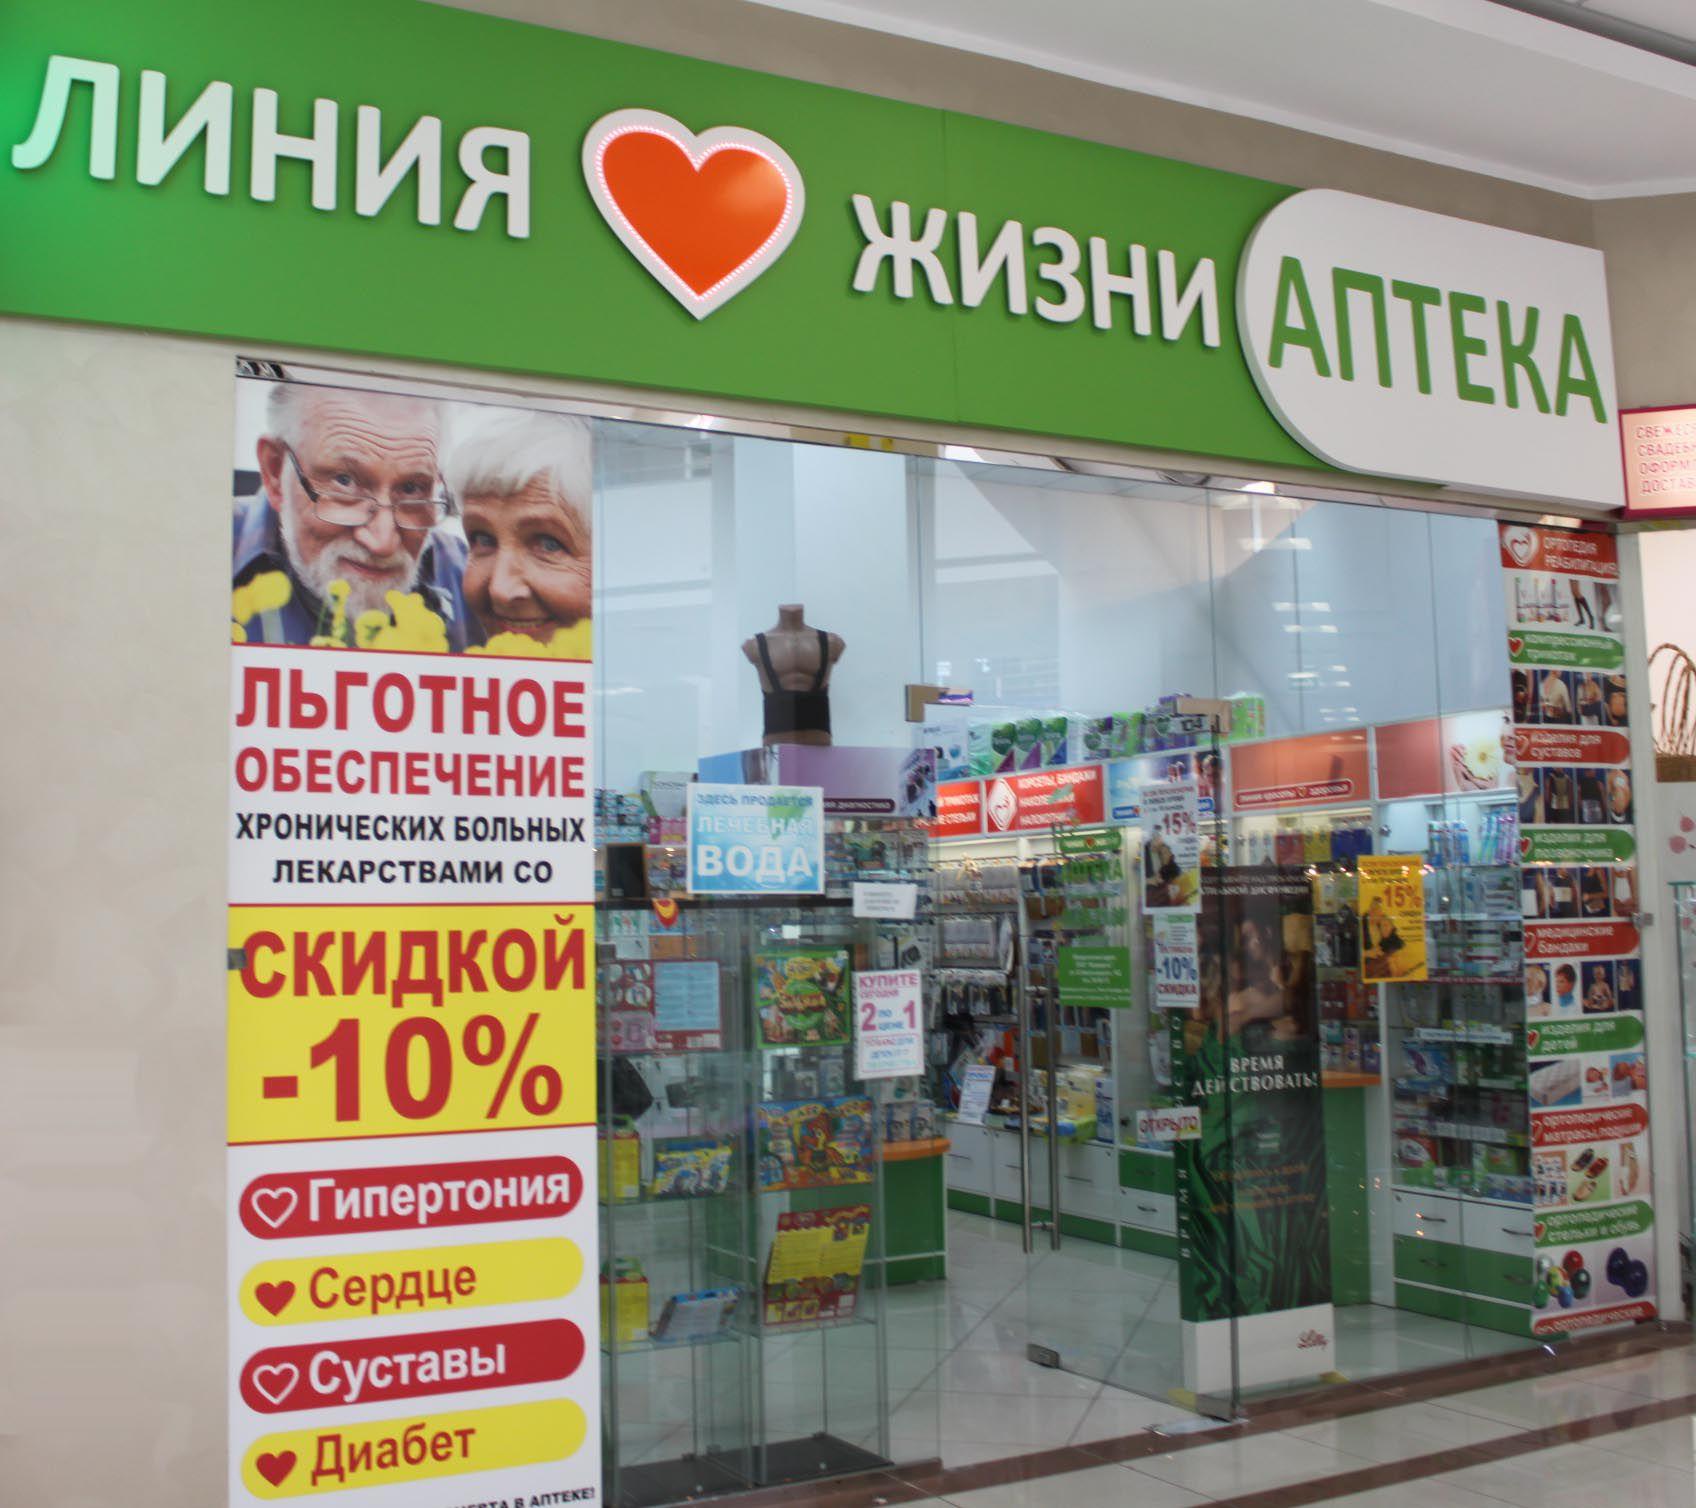 omsk-intim-magazin